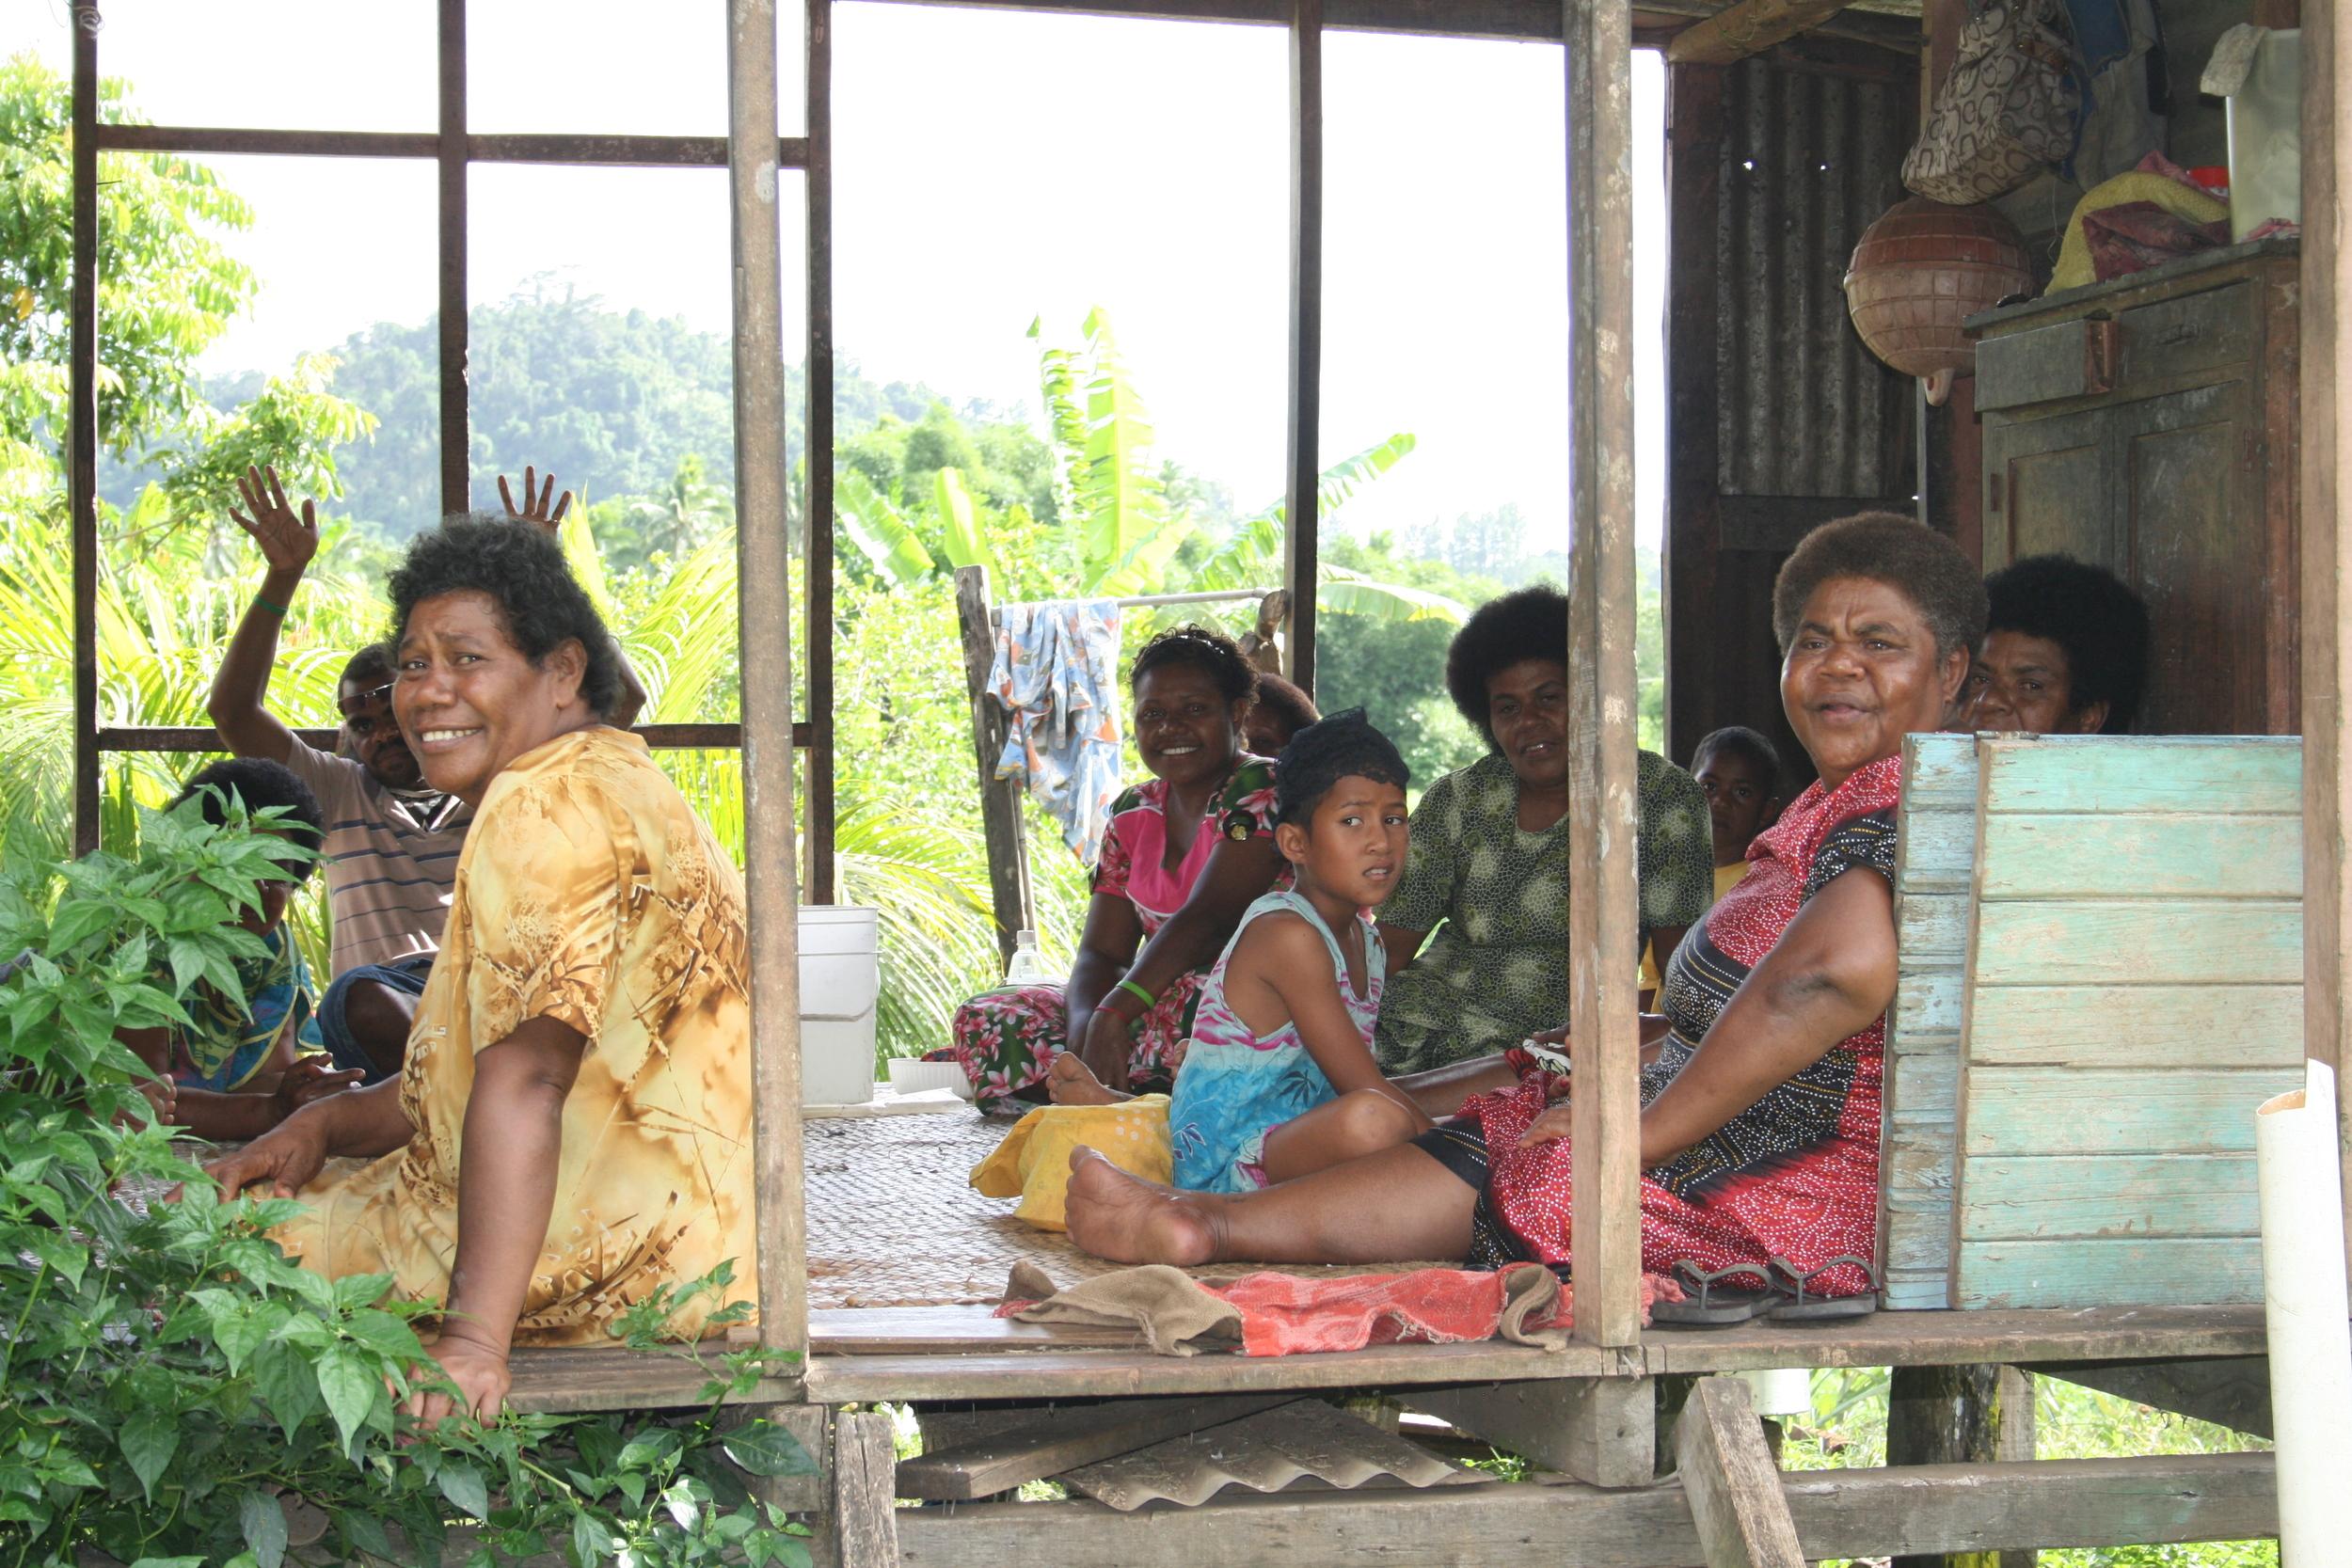 Fiji_village people.JPG